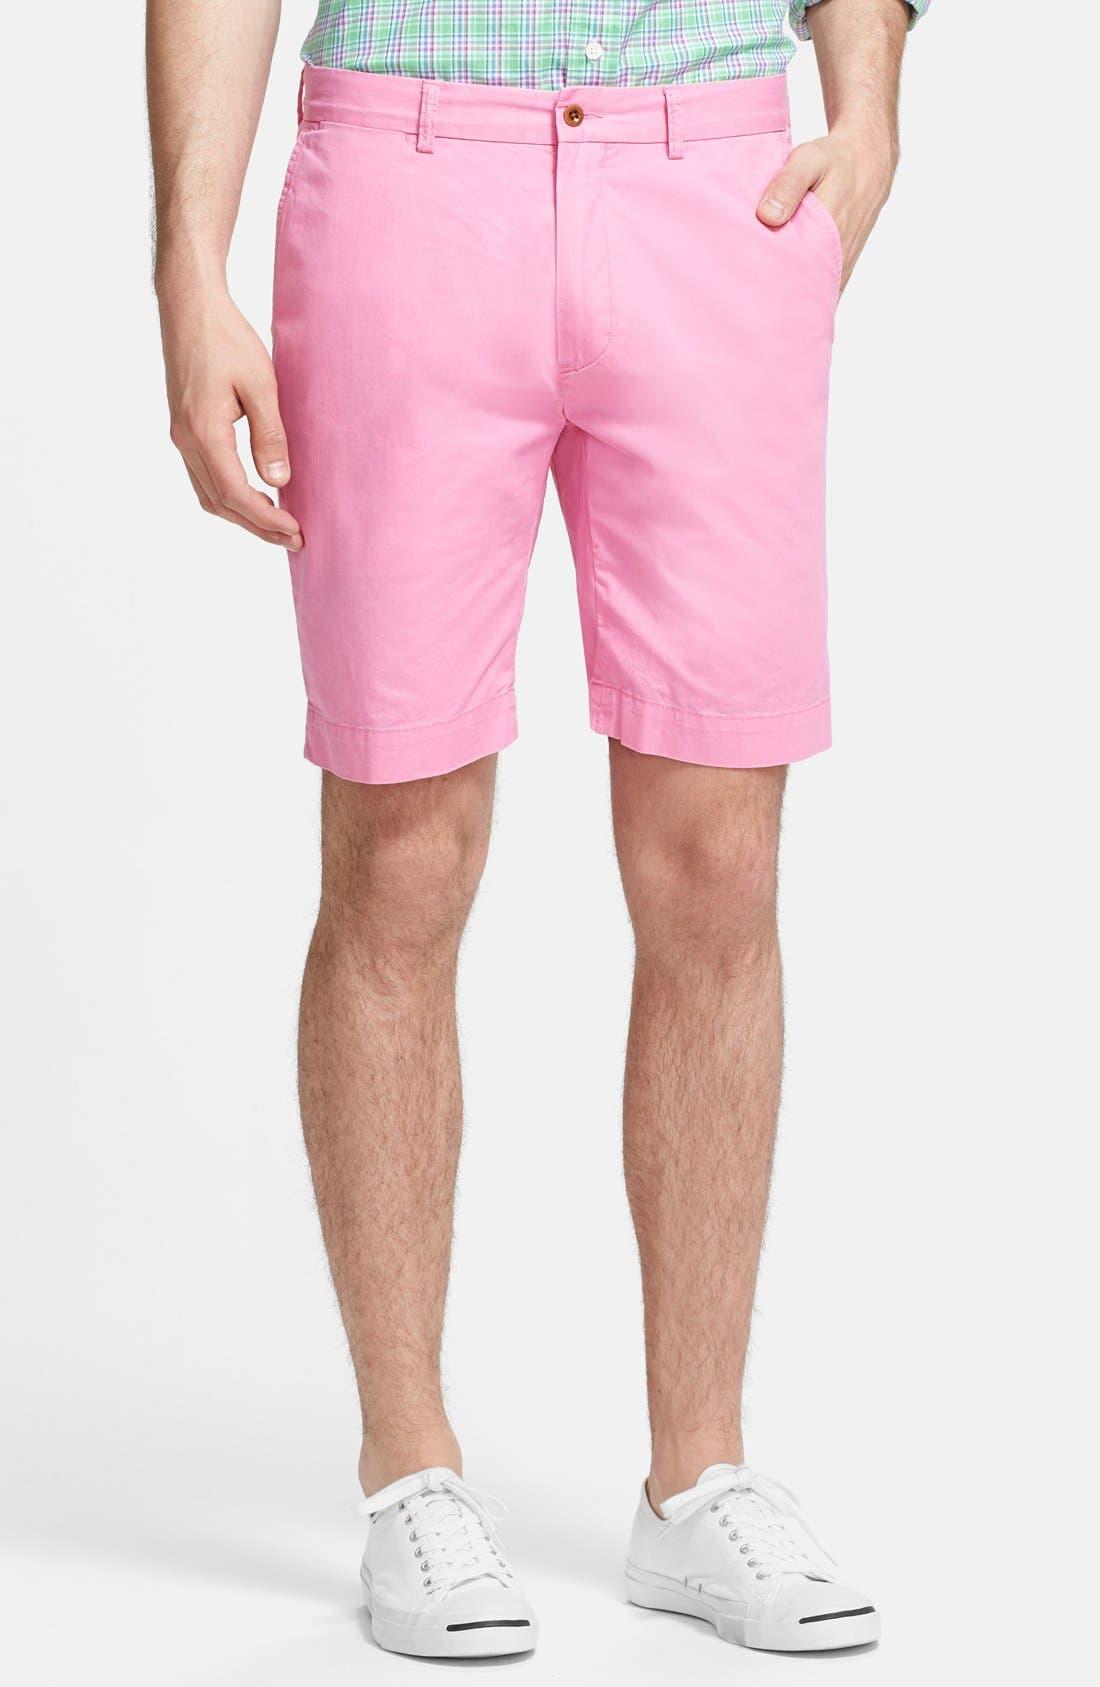 'Hudson' Flat Front Classic Fit Chino Shorts,                             Main thumbnail 1, color,                             670